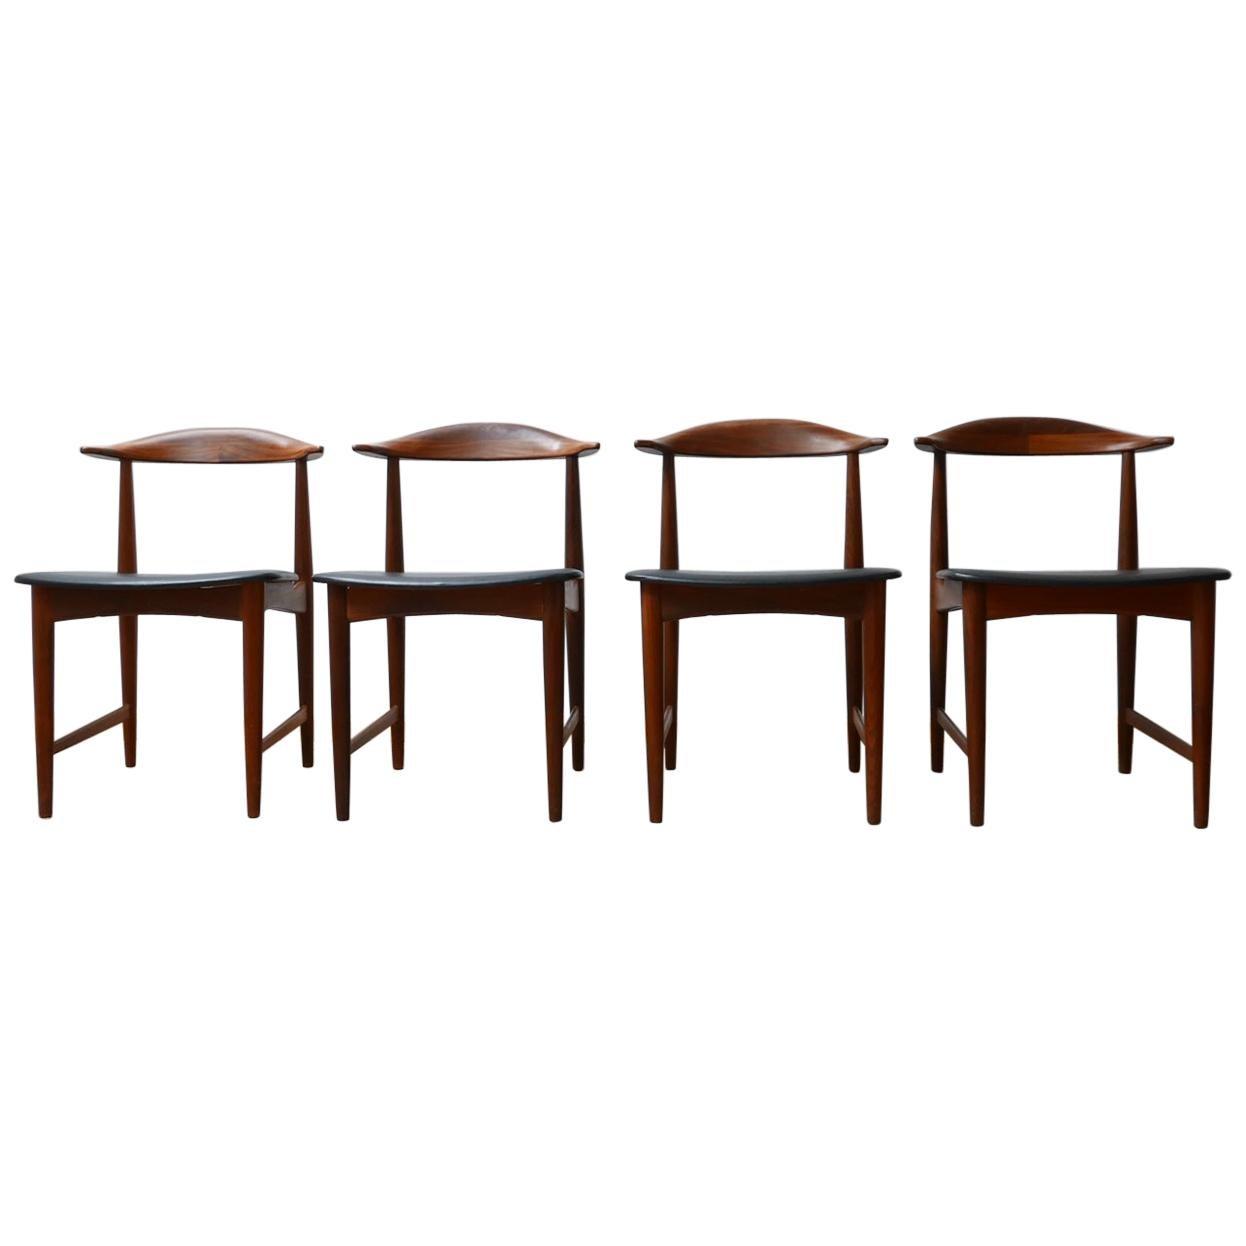 Danish 'Cow Horn' Midcentury Teak Dining Chairs '4'